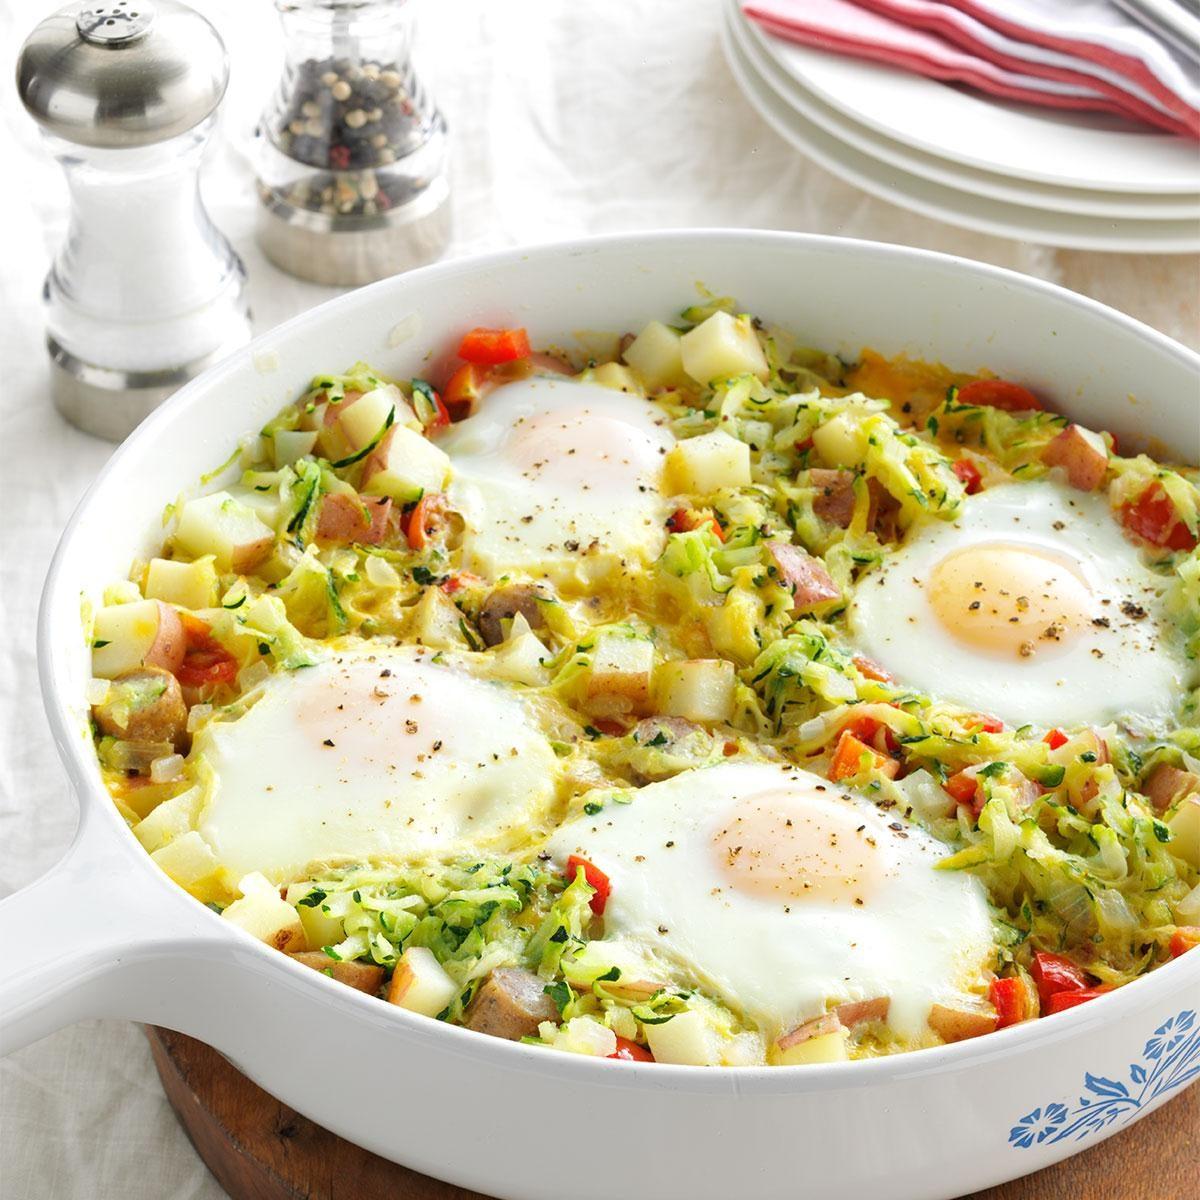 Zucchini Egg Skillet Recipe | Taste of Home